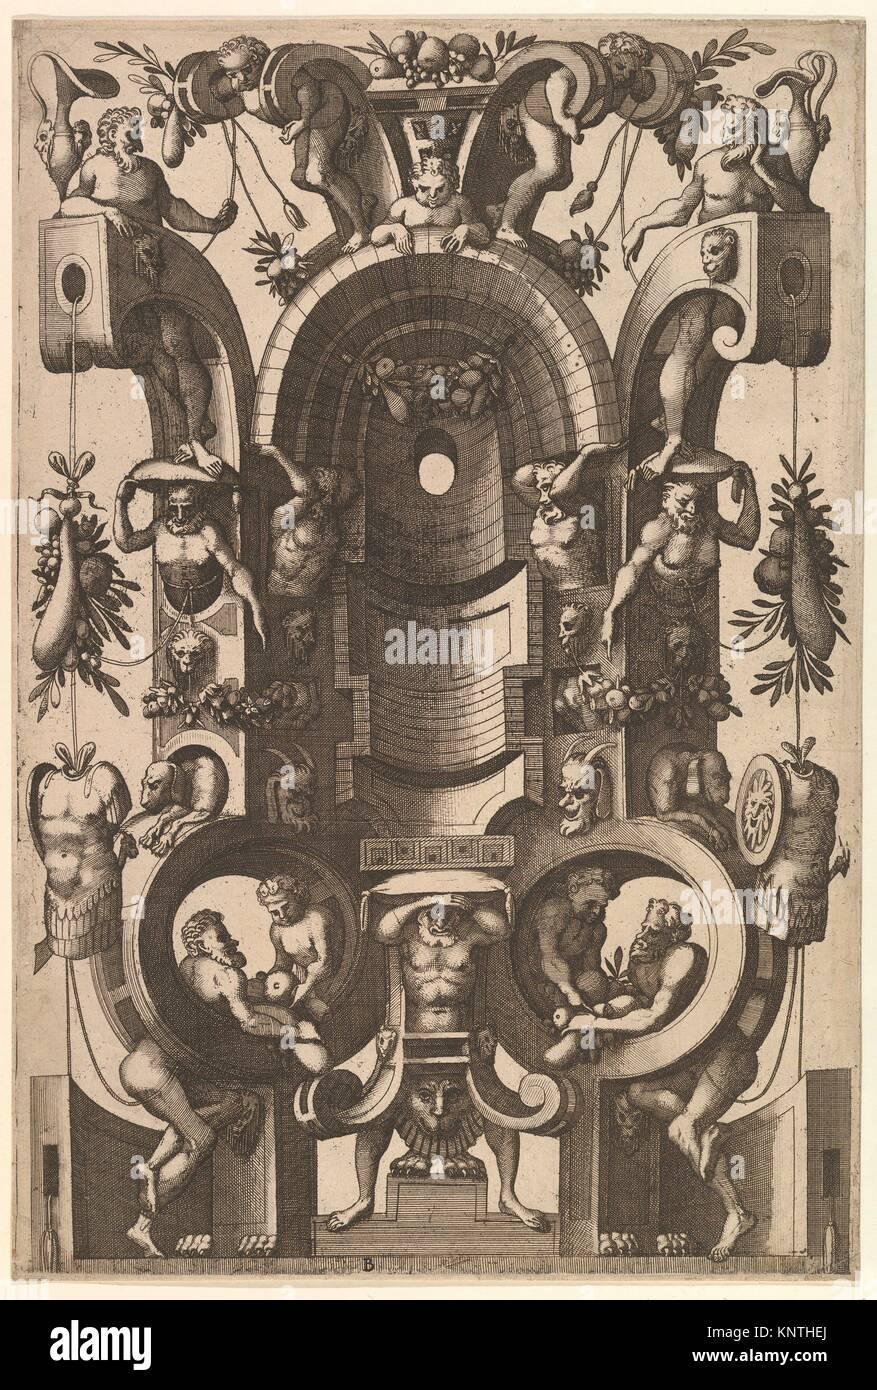 Di nicchia in forma di un cartiglio da Veelderleij Veranderinghe van grotissen ende Compertimenten.Libro primo. Immagini Stock